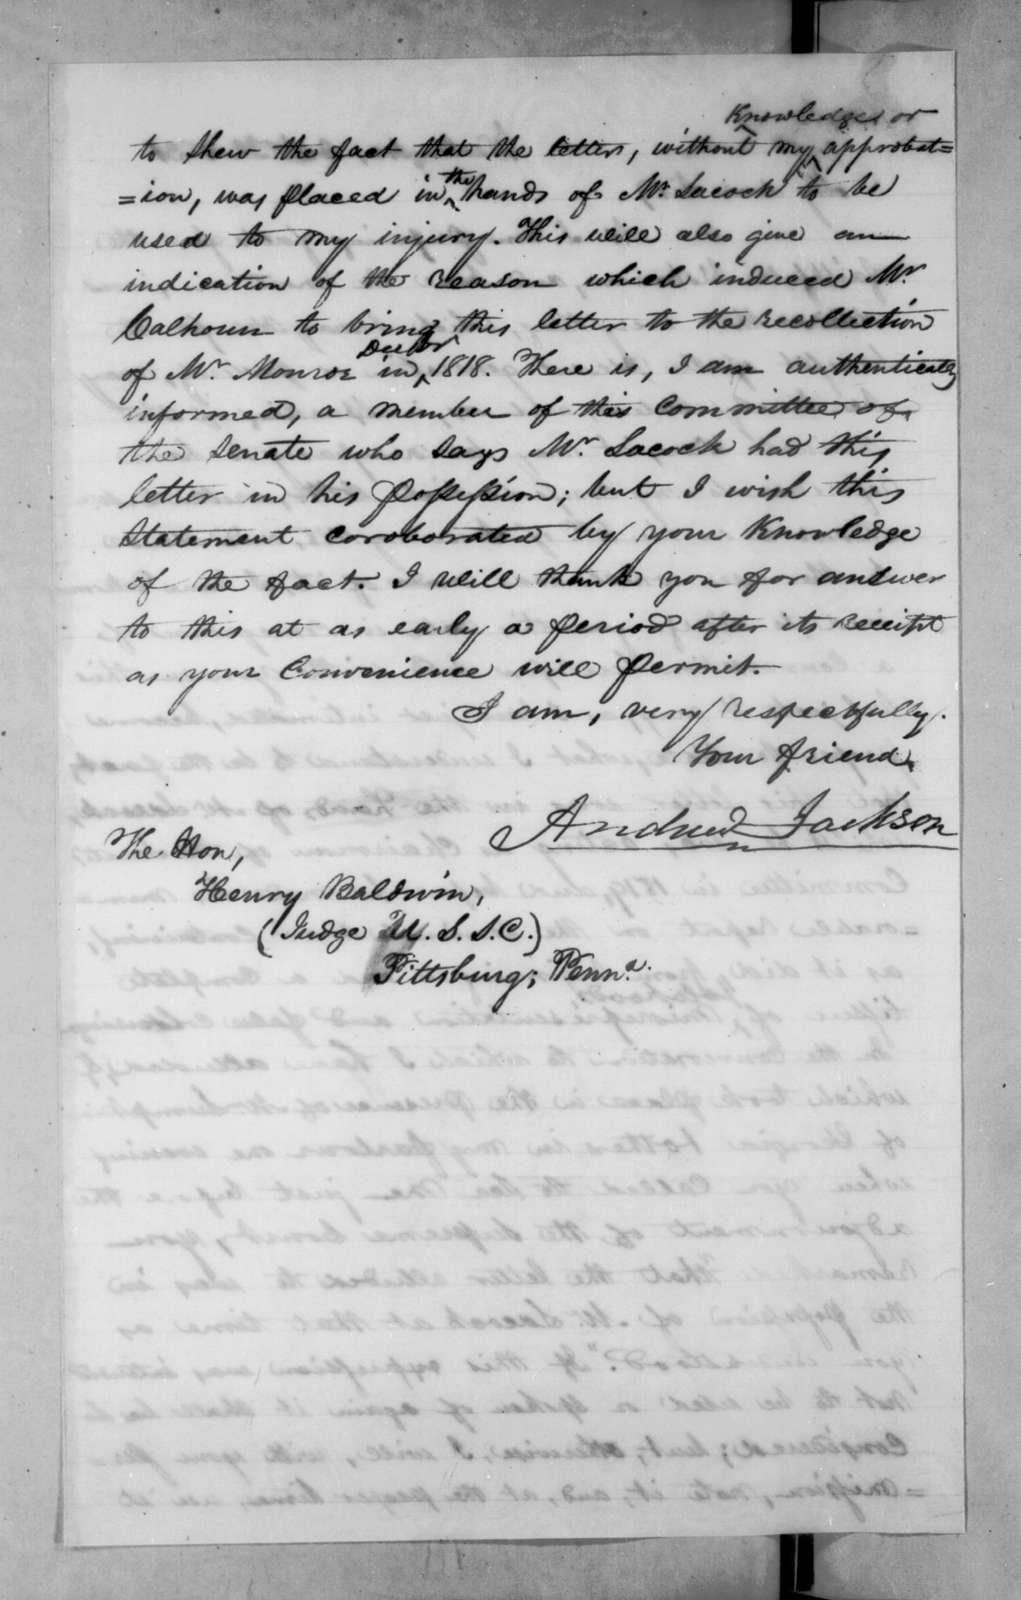 Andrew Jackson to Henry Baldwin, October 31, 1831